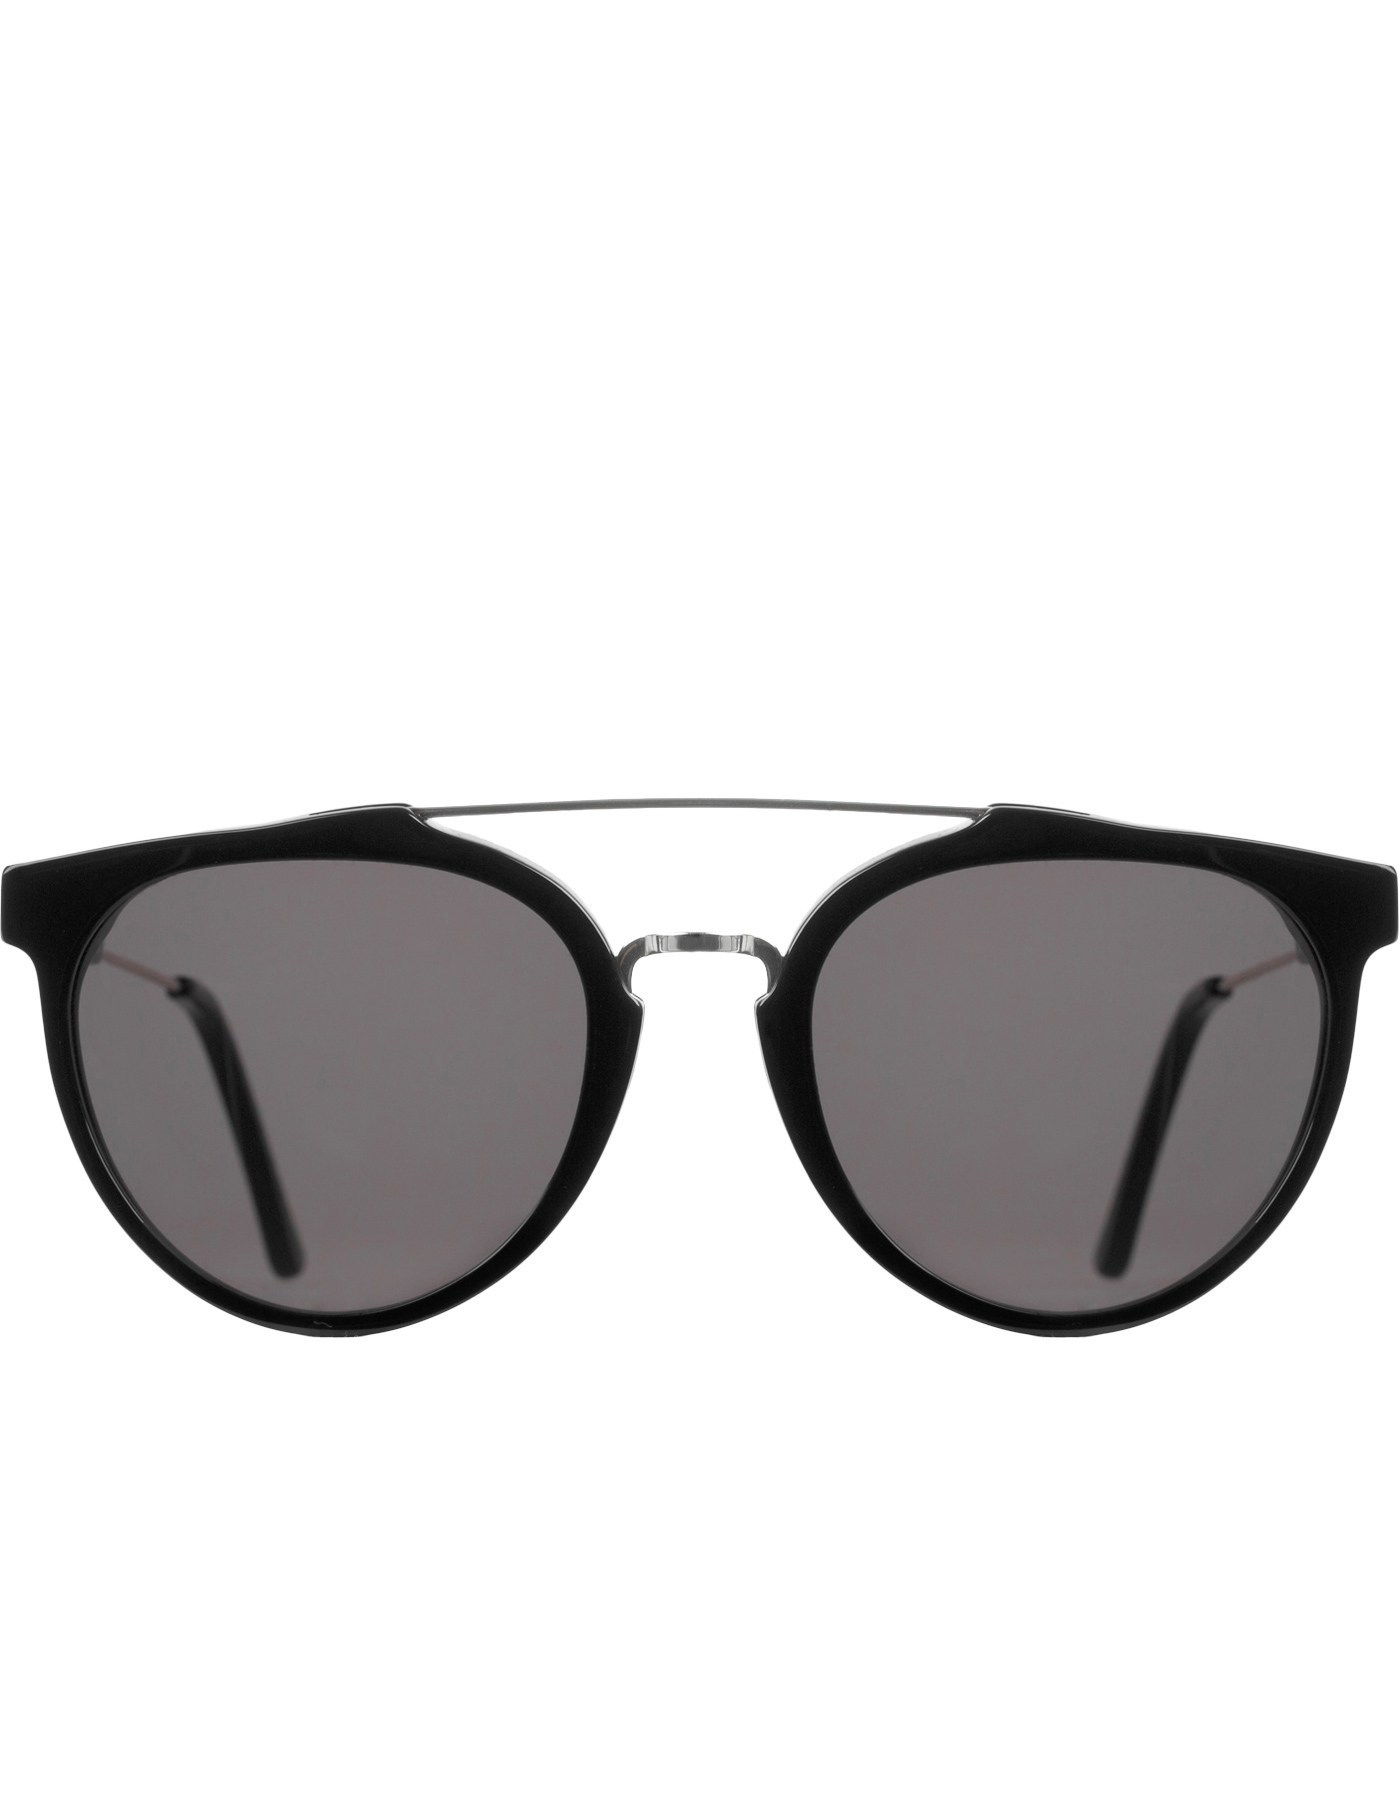 Dc Hbx Retrosuperfuture Giaguaro Black Sunglasses In Black Lyst